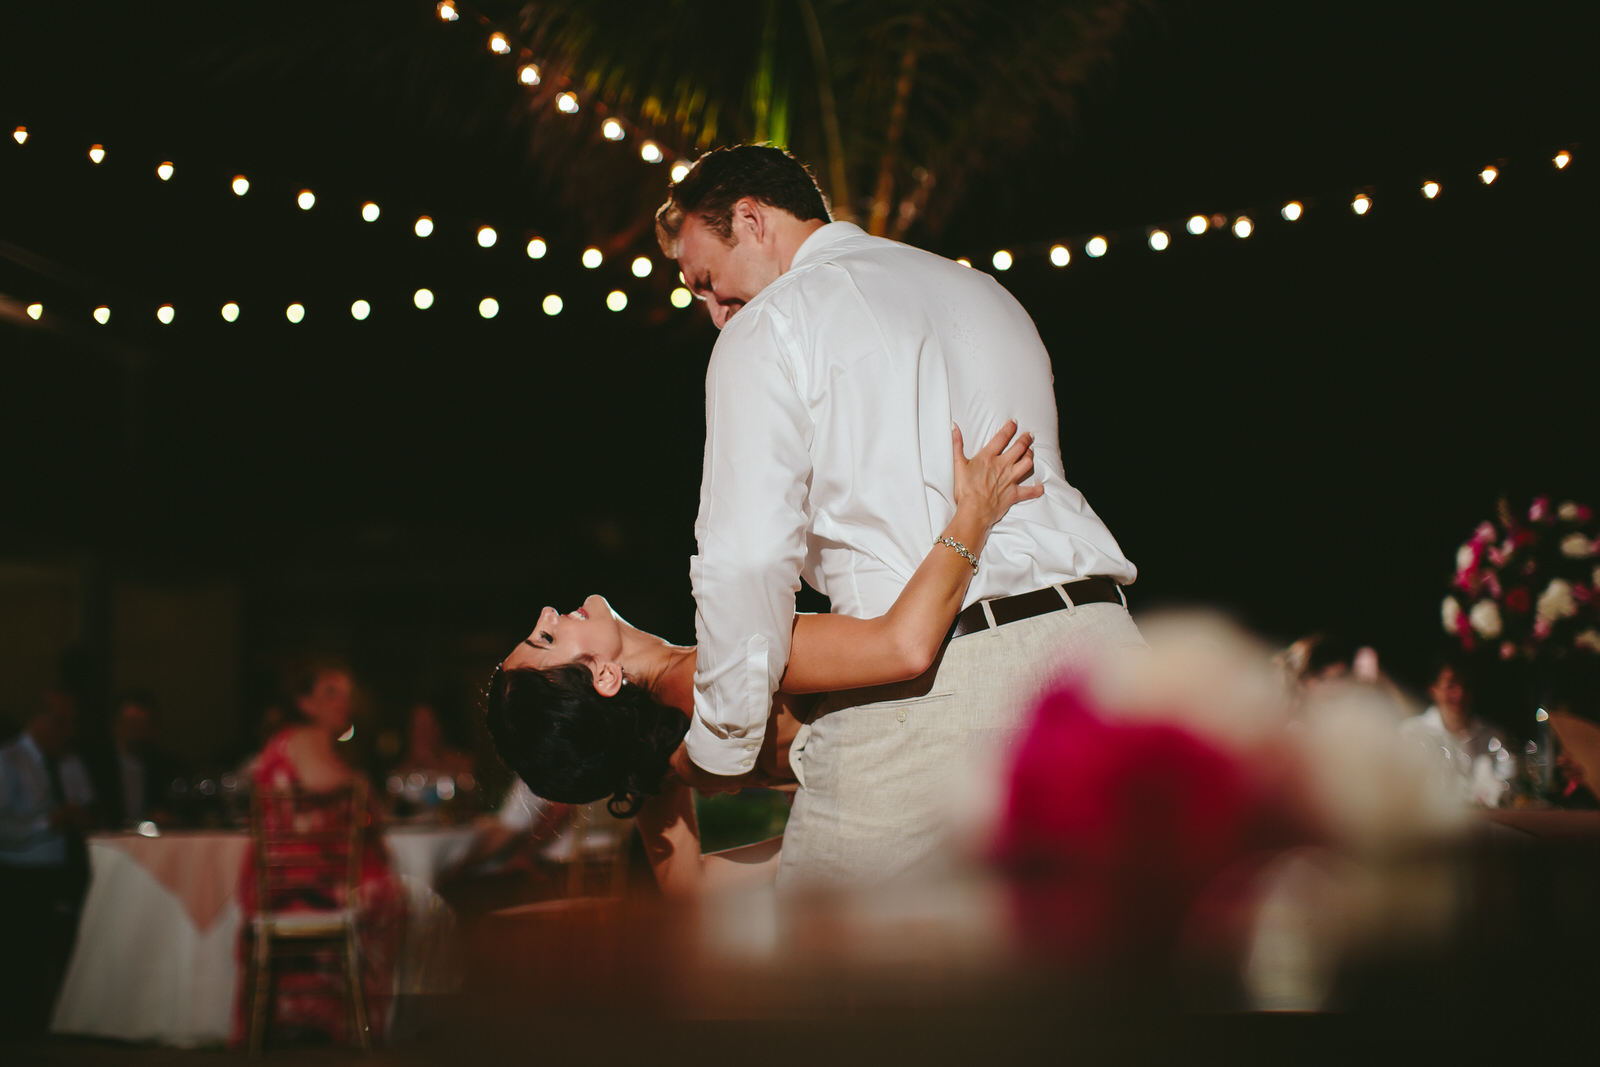 dip_bride_groom_first_dance_mexico_wedding_reception.jpg